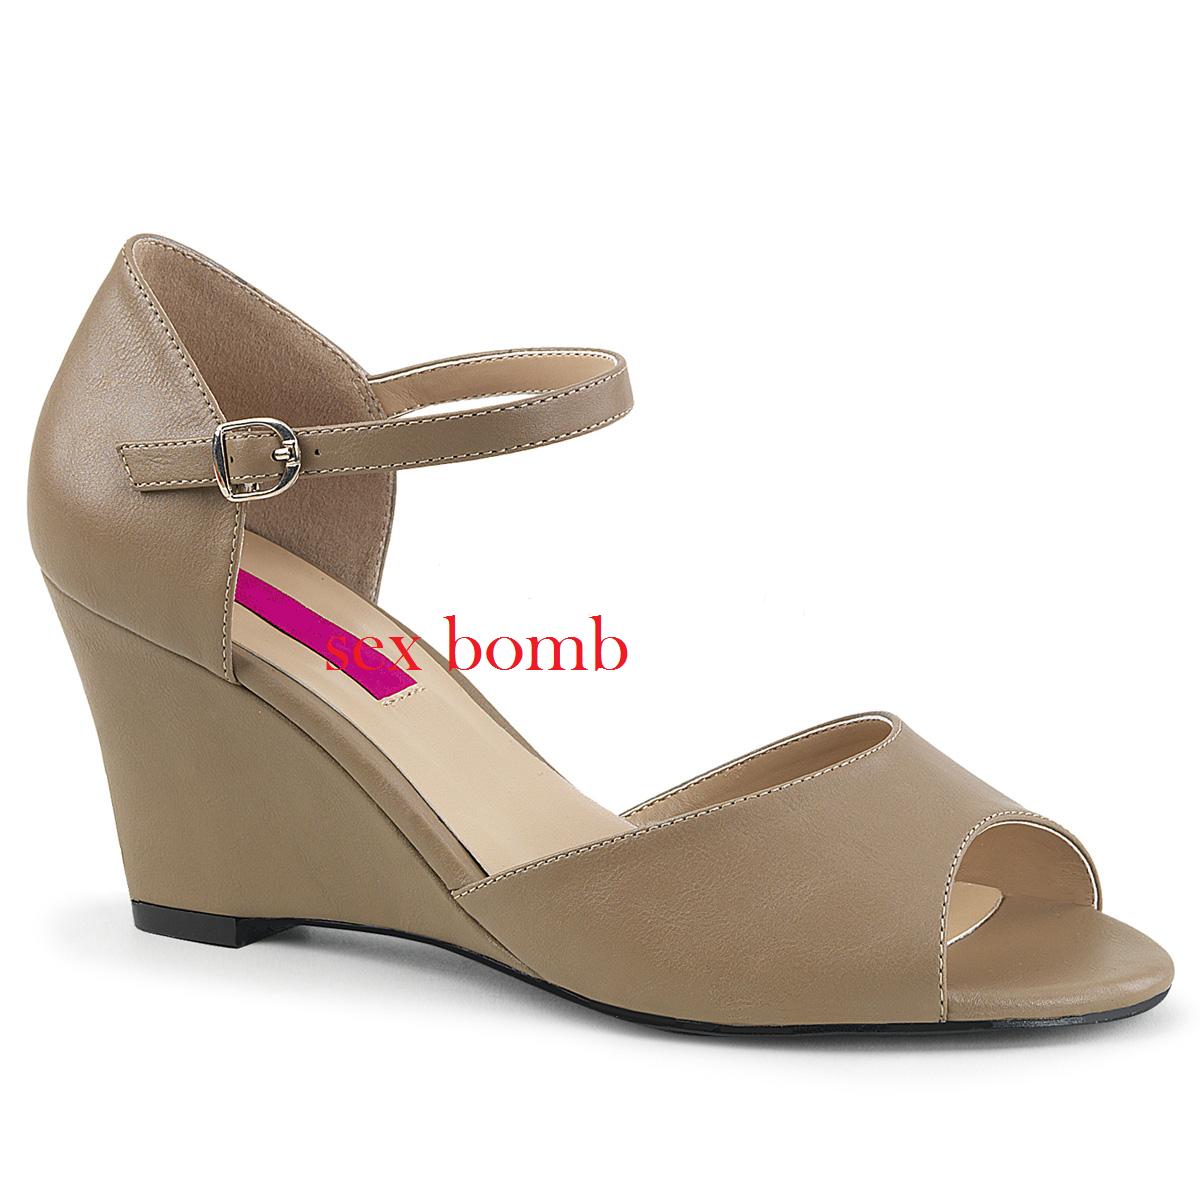 SANDALI ZEPPA tacco 7,5 dal 39 al 46 46 46 TORTORA OPACO cinturino zapatos SEXY glamour  precios ultra bajos